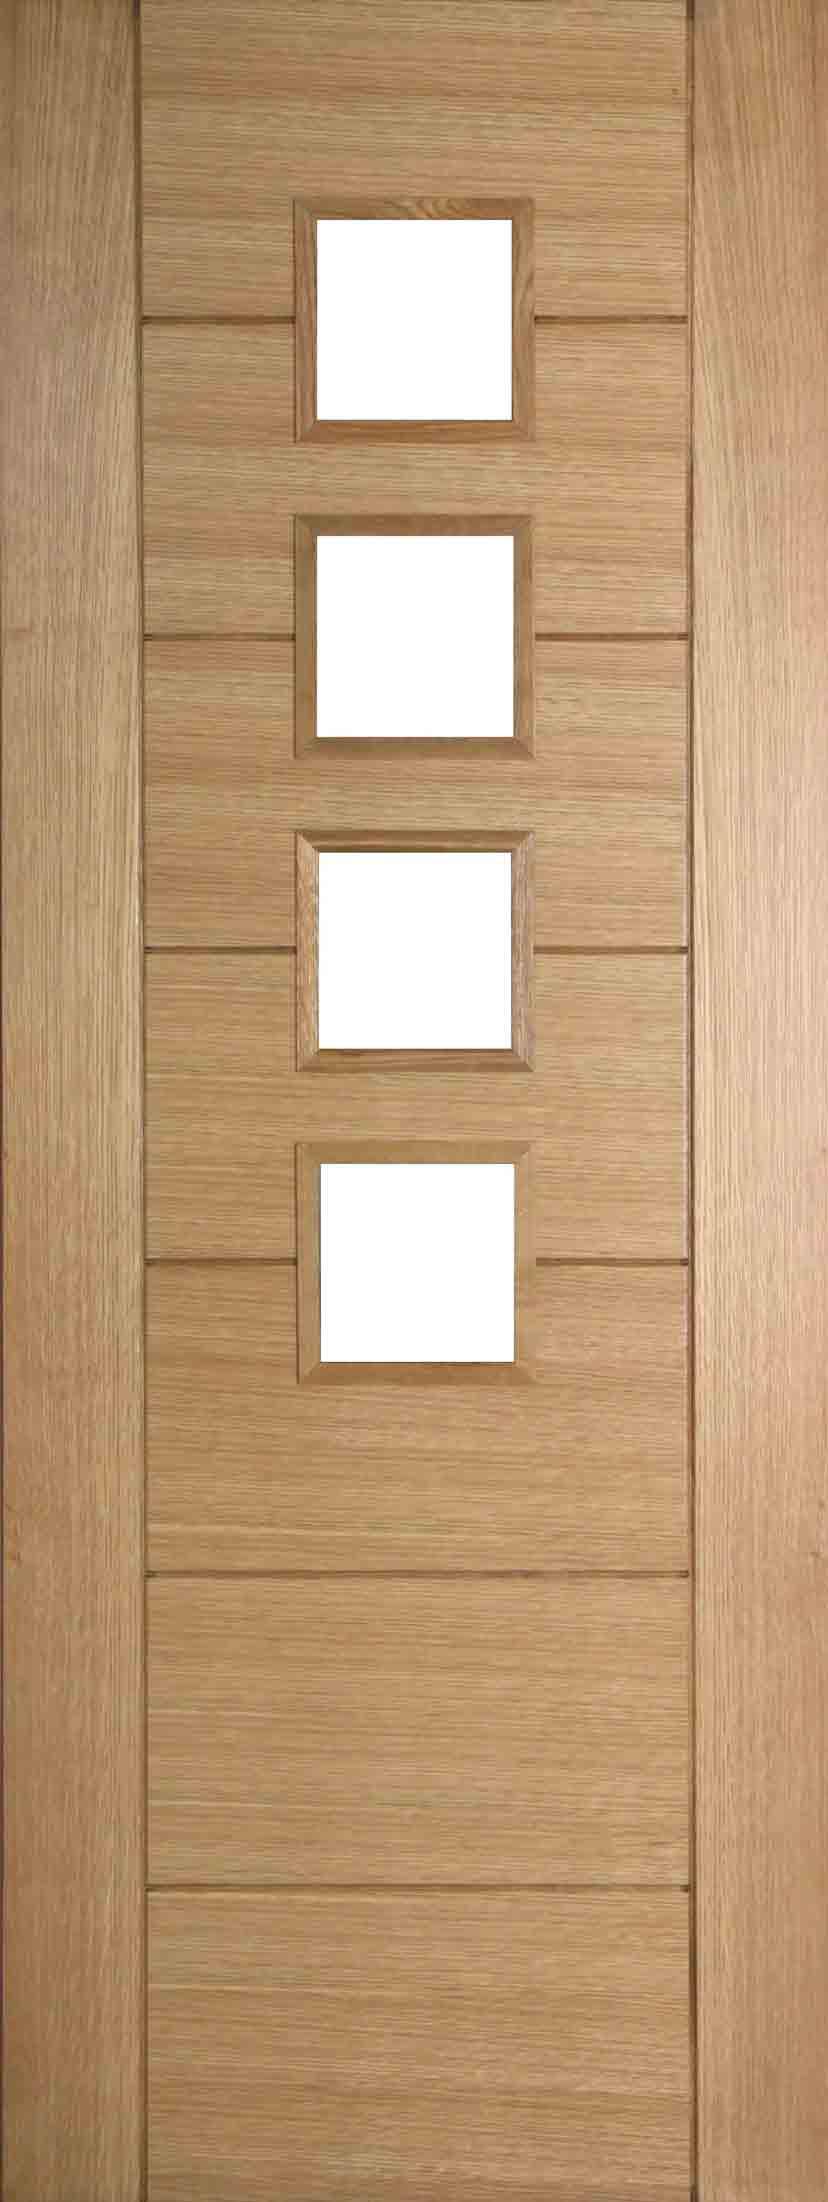 Internal Oak 994 Door Prefinished with Clear Flat Glass